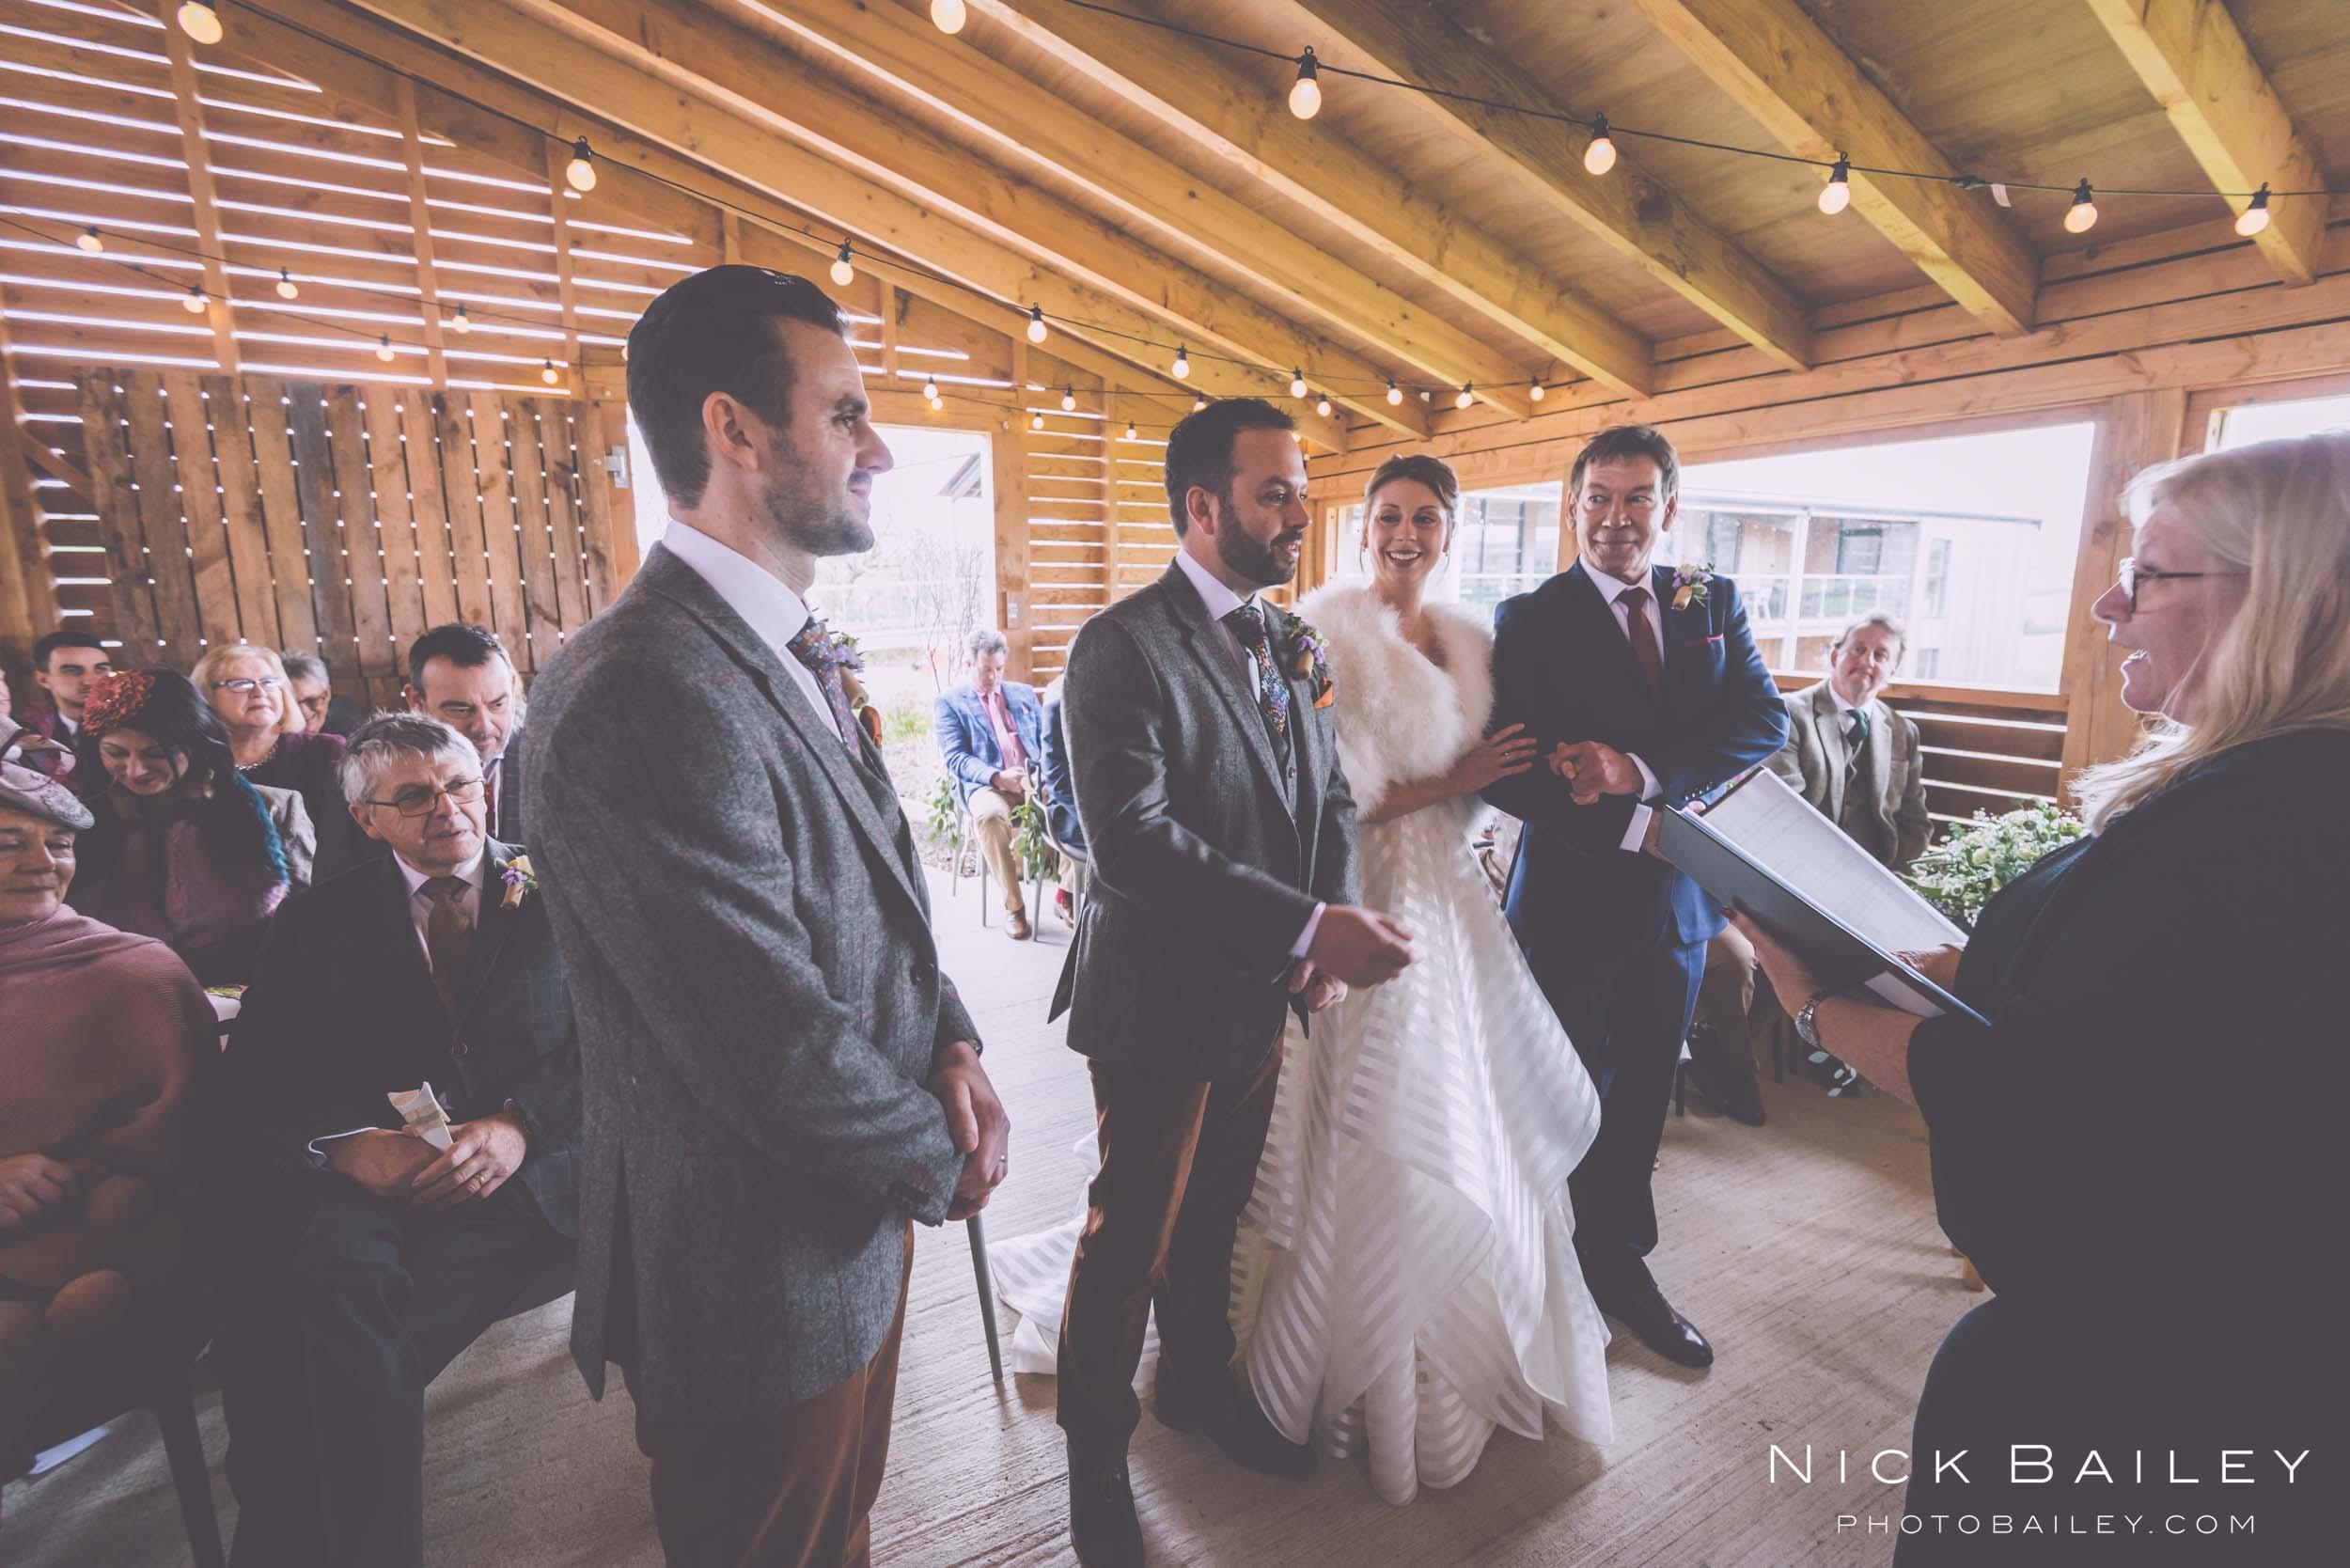 trevibban-mill-wedding-30.jpg